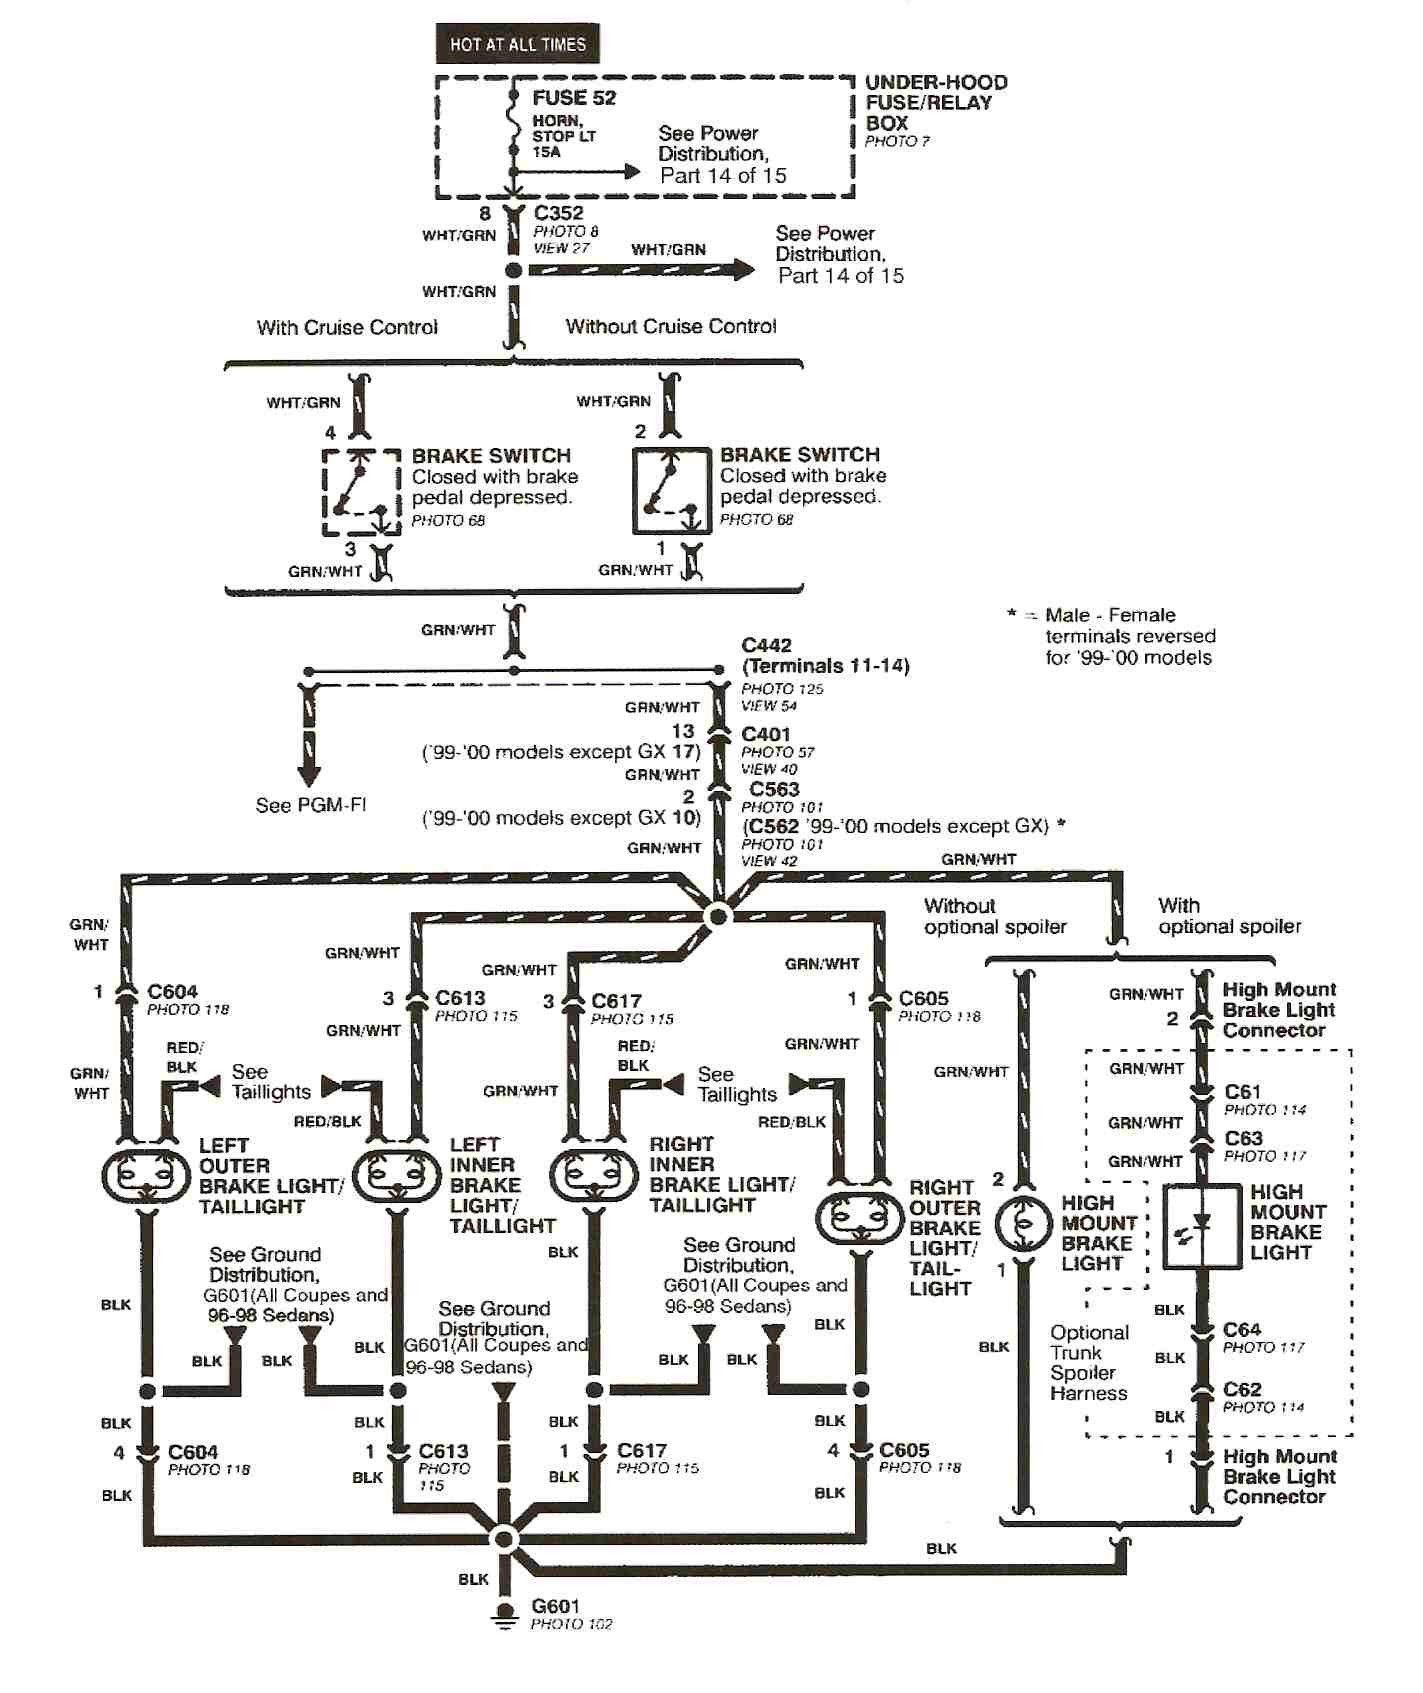 Awesome 1998 Honda Civic Wiring Diagram In 2020 2000 Honda Civic Honda Civic Engine Honda